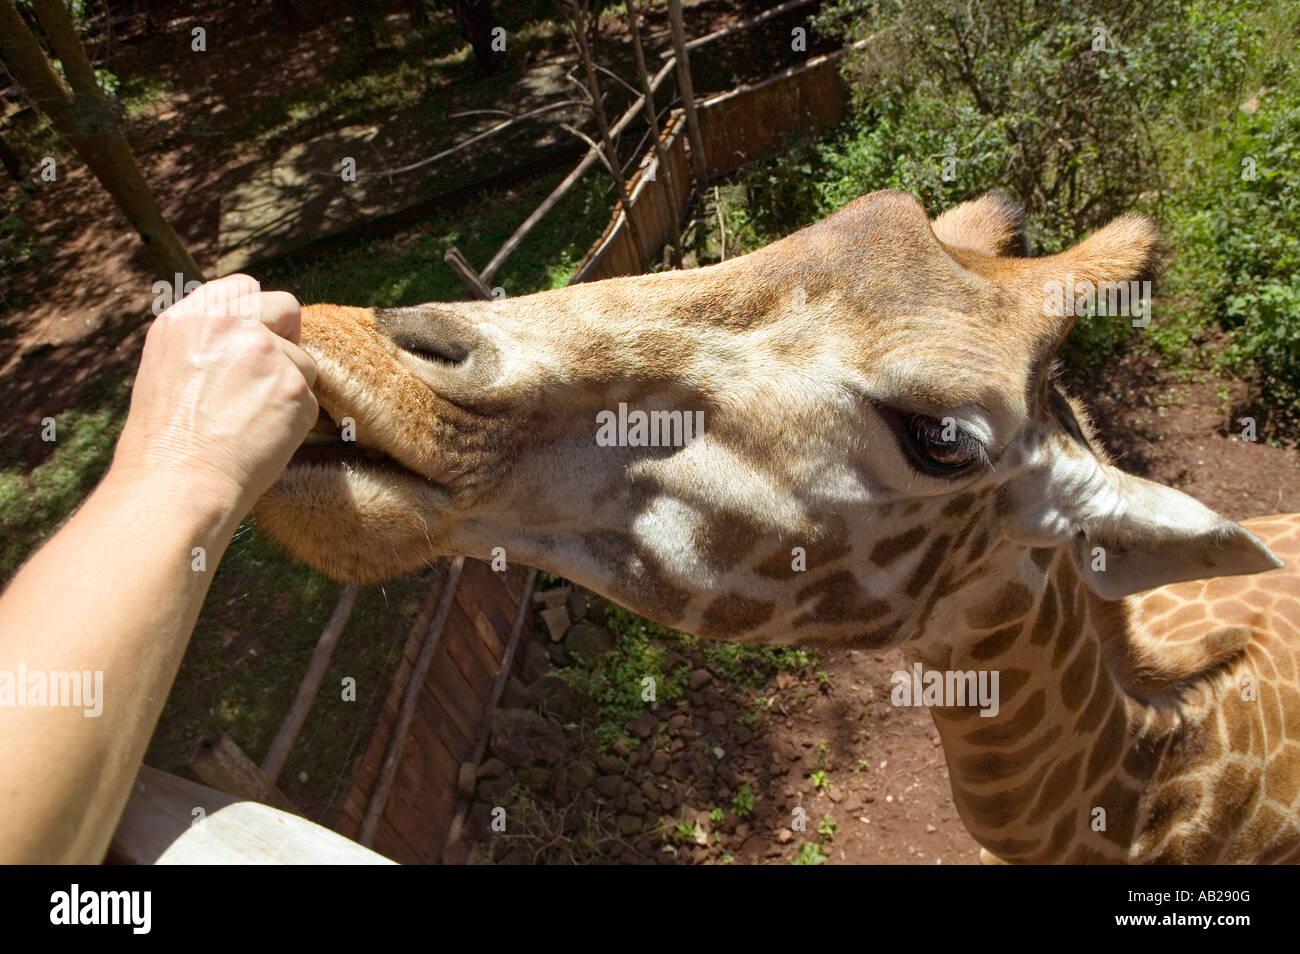 Close up of Rothschild giraffe s at the African Fund for Endangered Wildlife Giraffe Center near Nairobi National - Stock Image